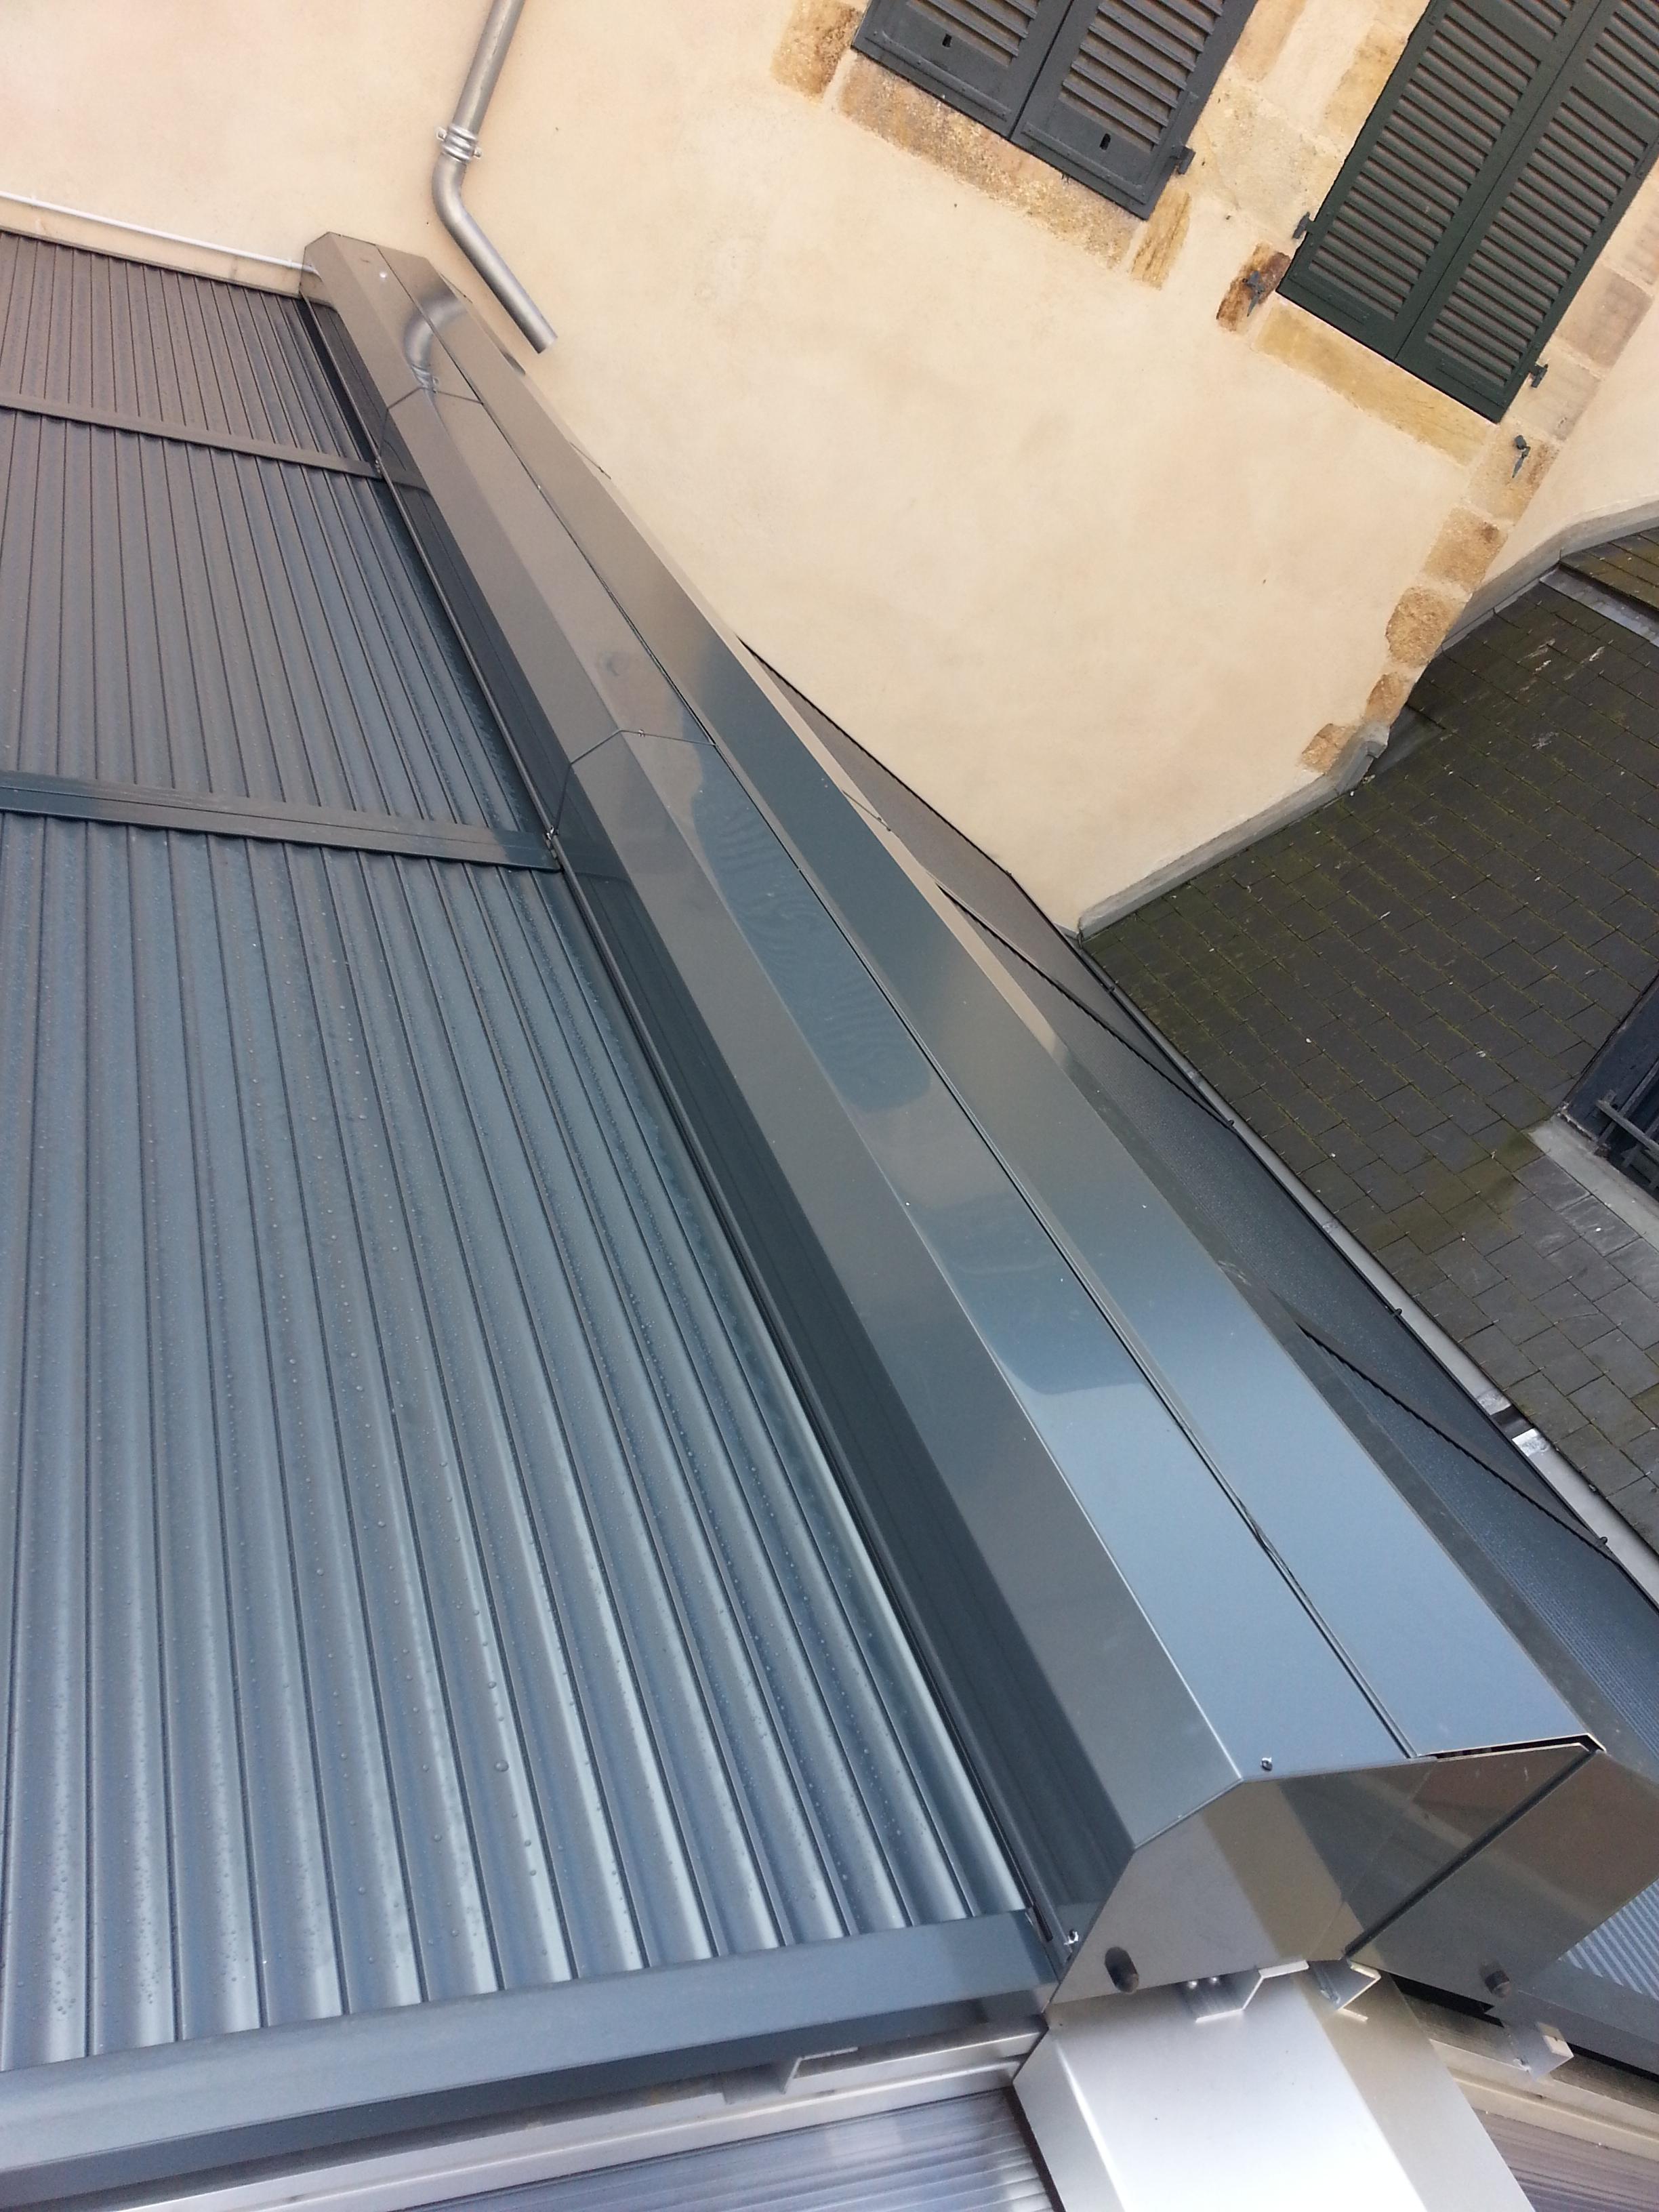 fabricant volet roulant pour toiture veranda. Black Bedroom Furniture Sets. Home Design Ideas